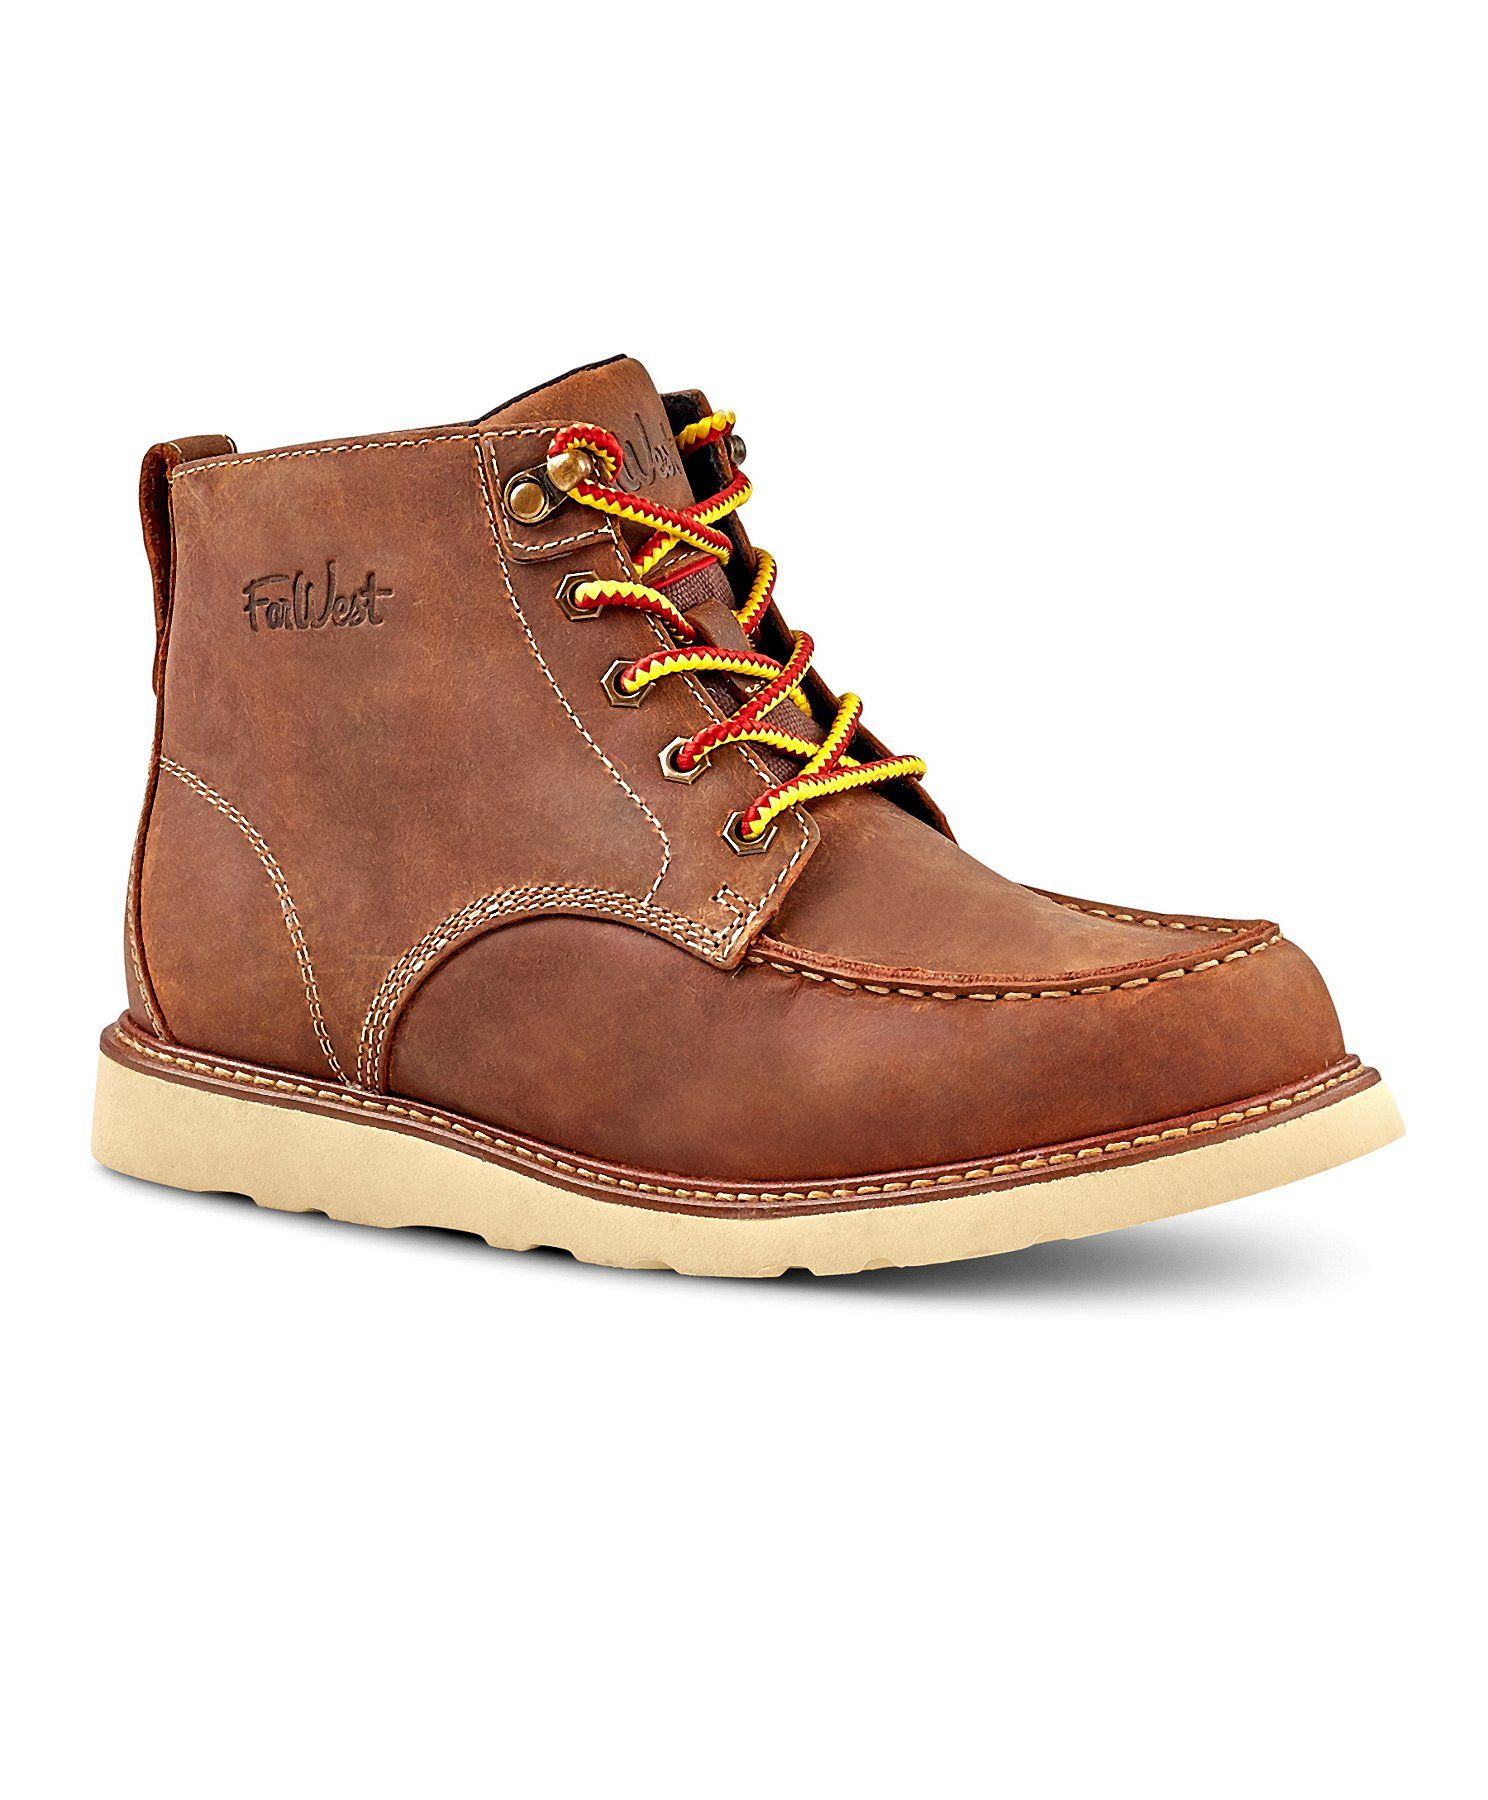 5f8442e7 FarWest Men's Kitsilano Boots   Clothes   Boots, Hiking boots, Men